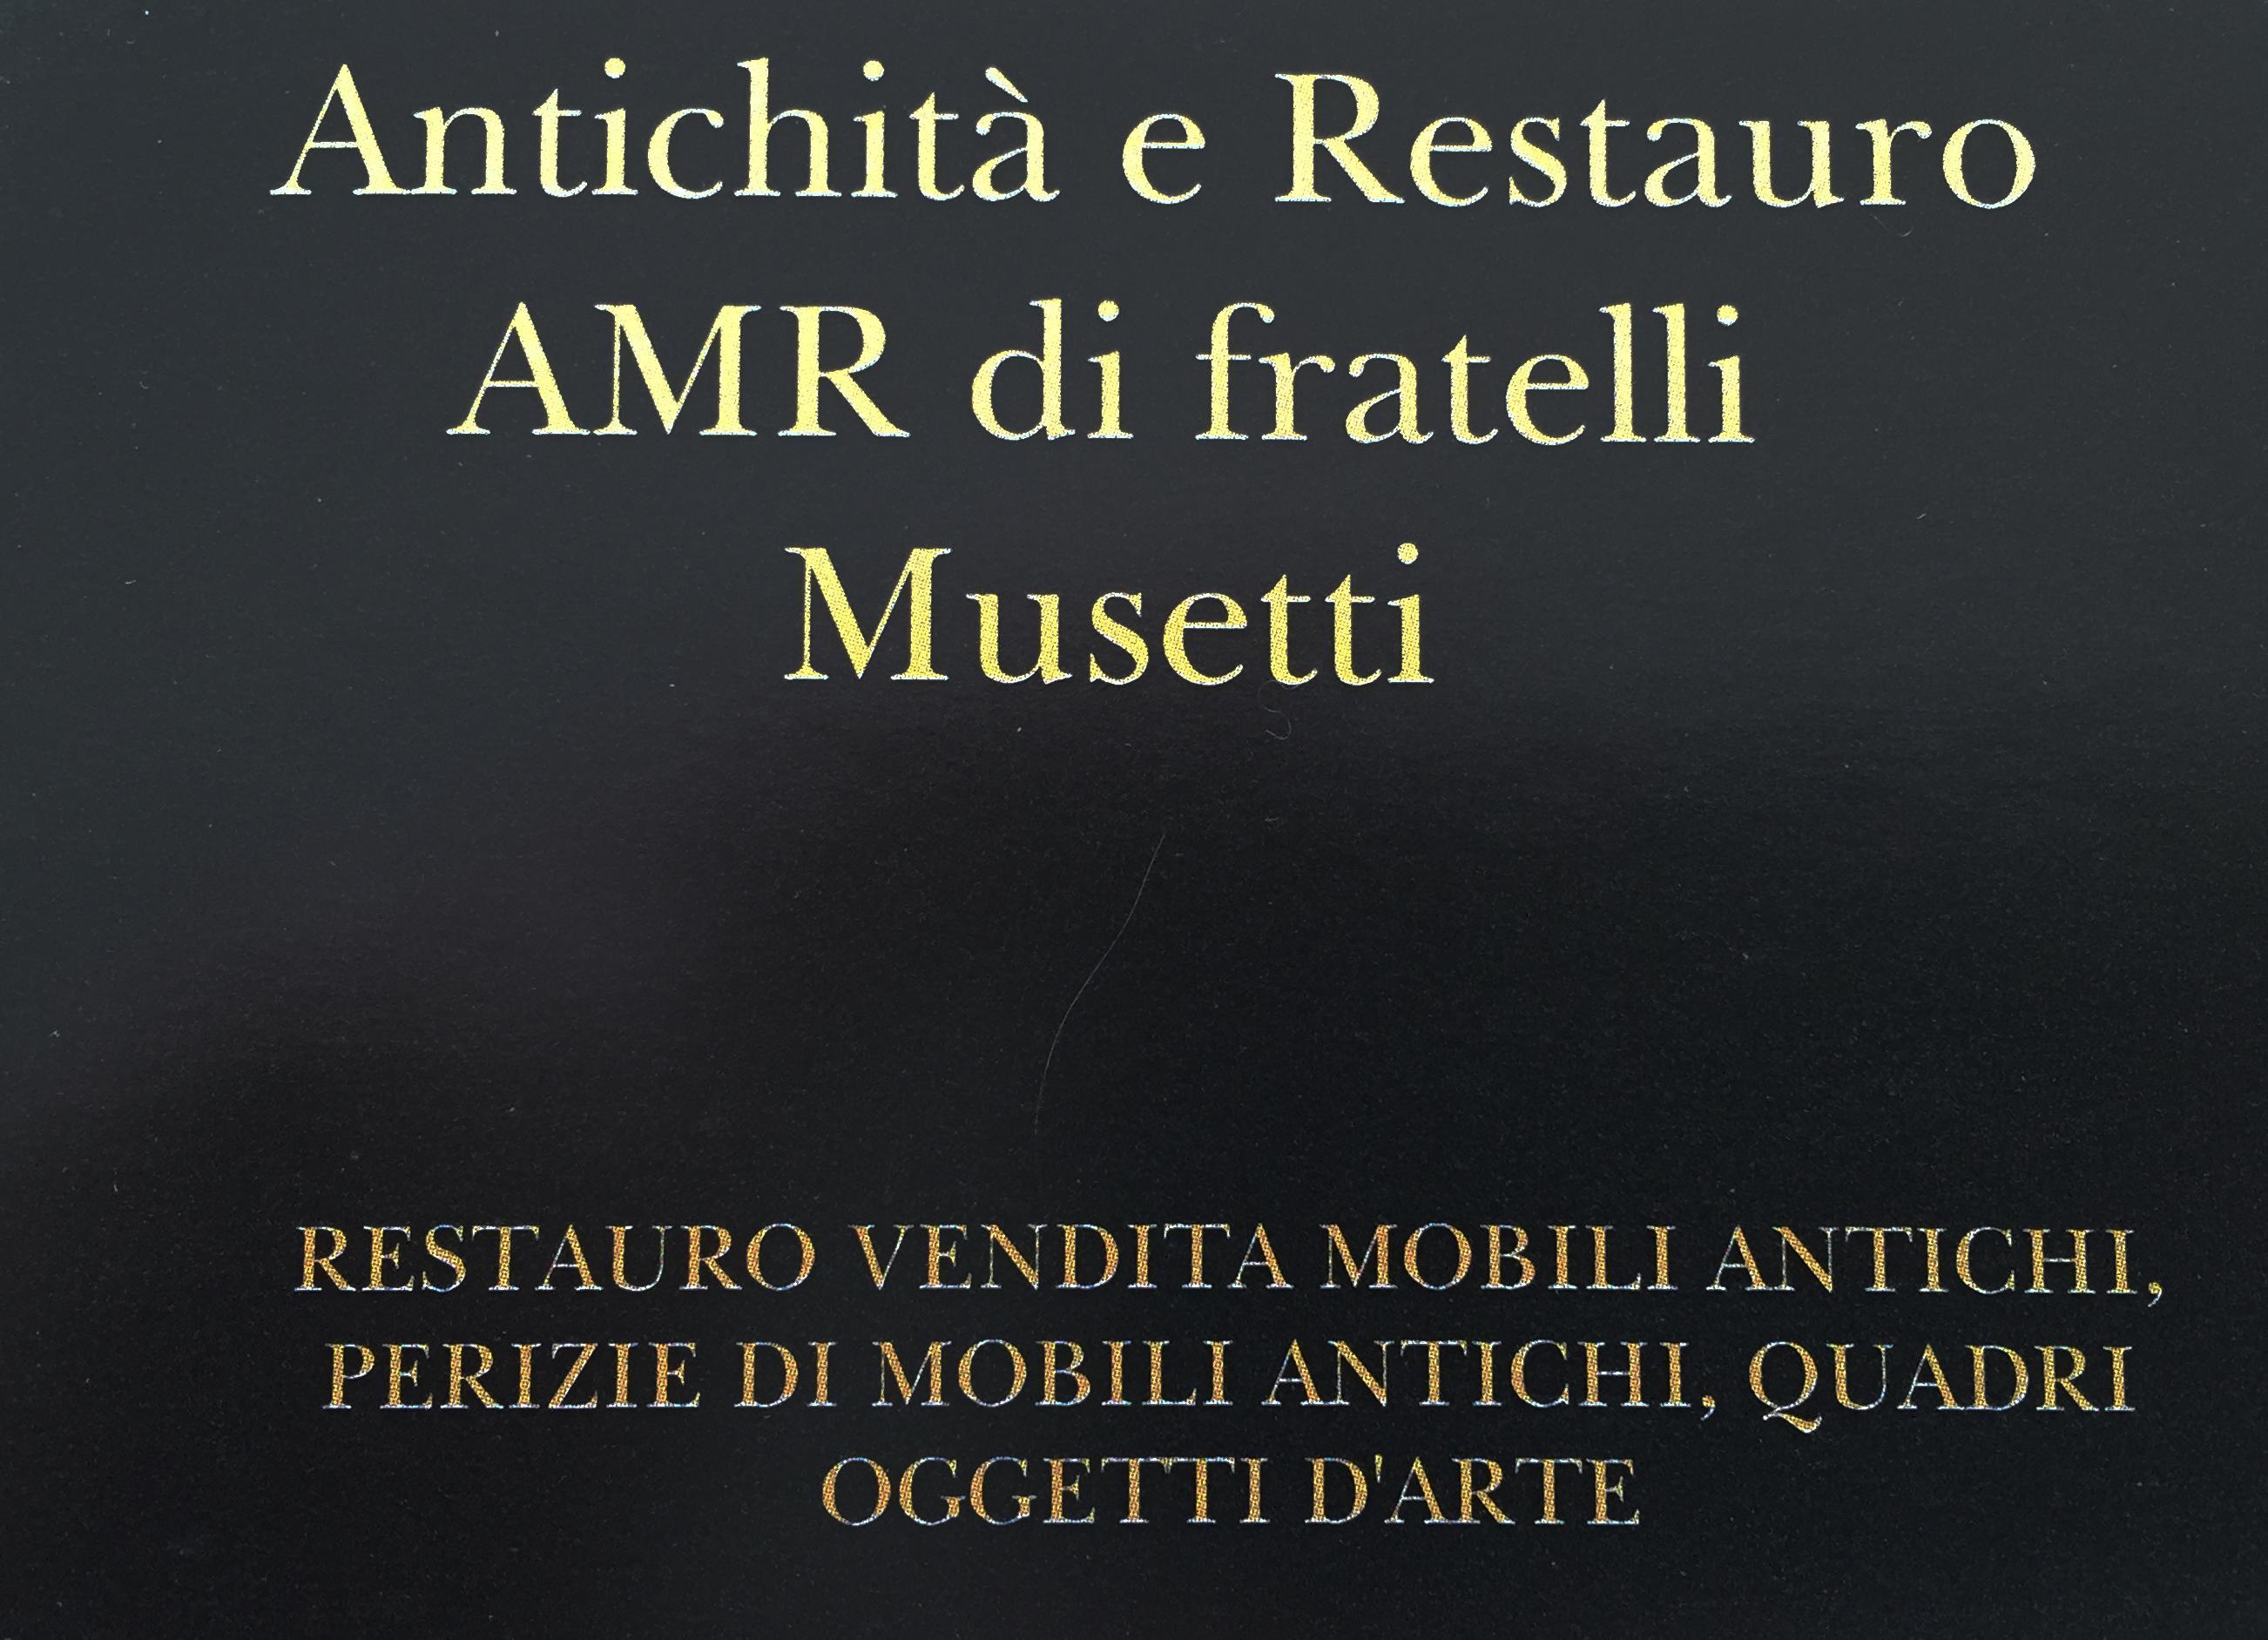 Padova restauro vendita antichit arredamento for Mobili 900 vendita